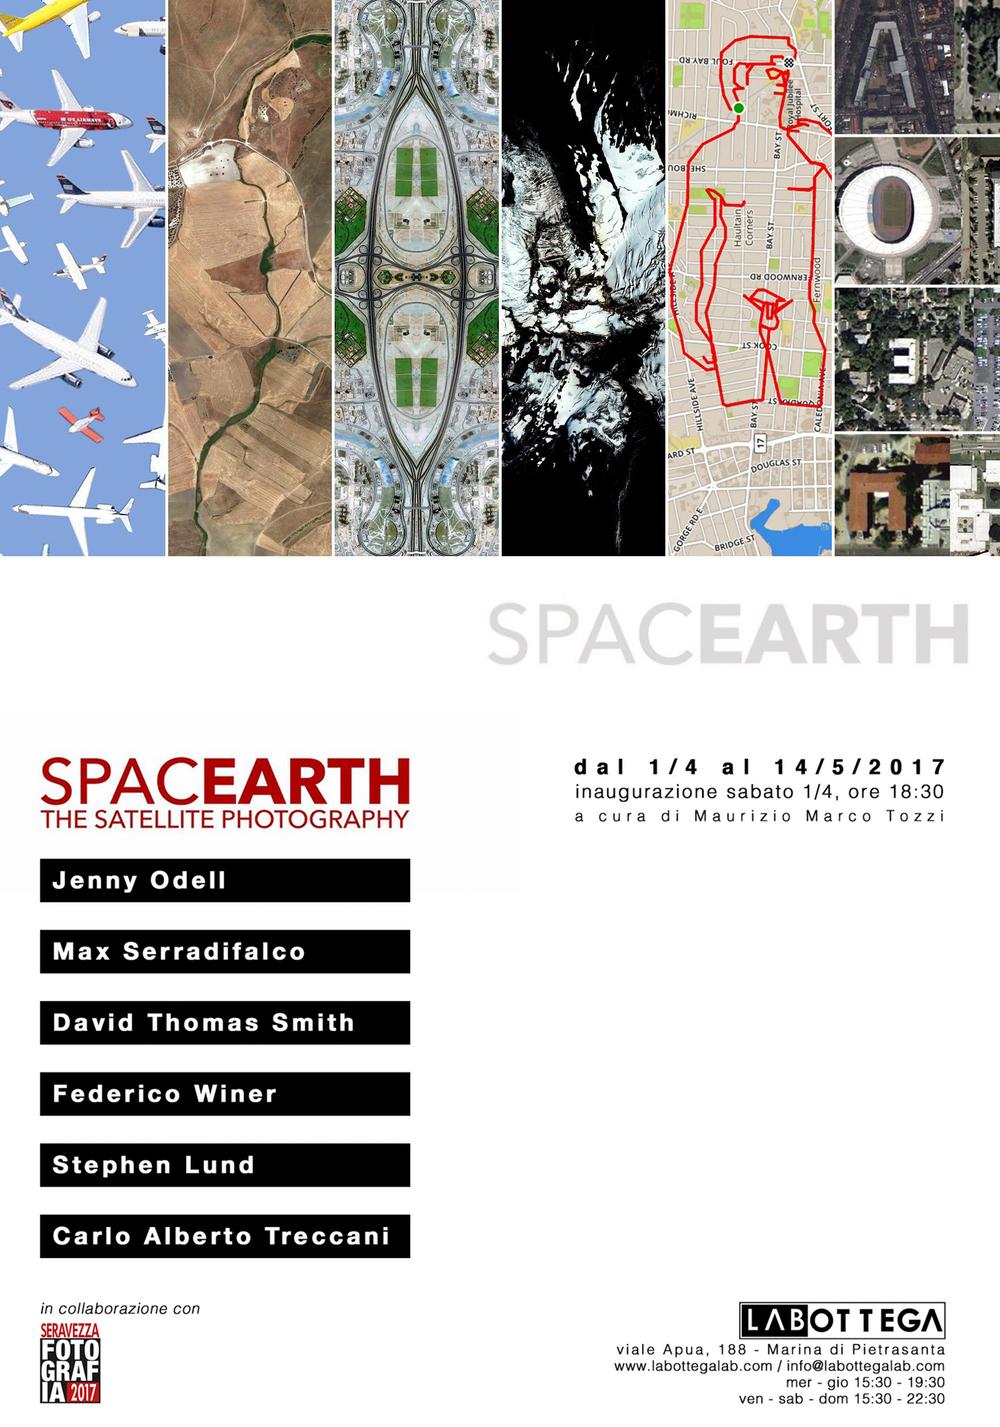 SpacEarth Exhibition. La Bottega Gallery. Marina di Pietrasanta, Toscana, Italy. Opening April 1st - 6:30pm.